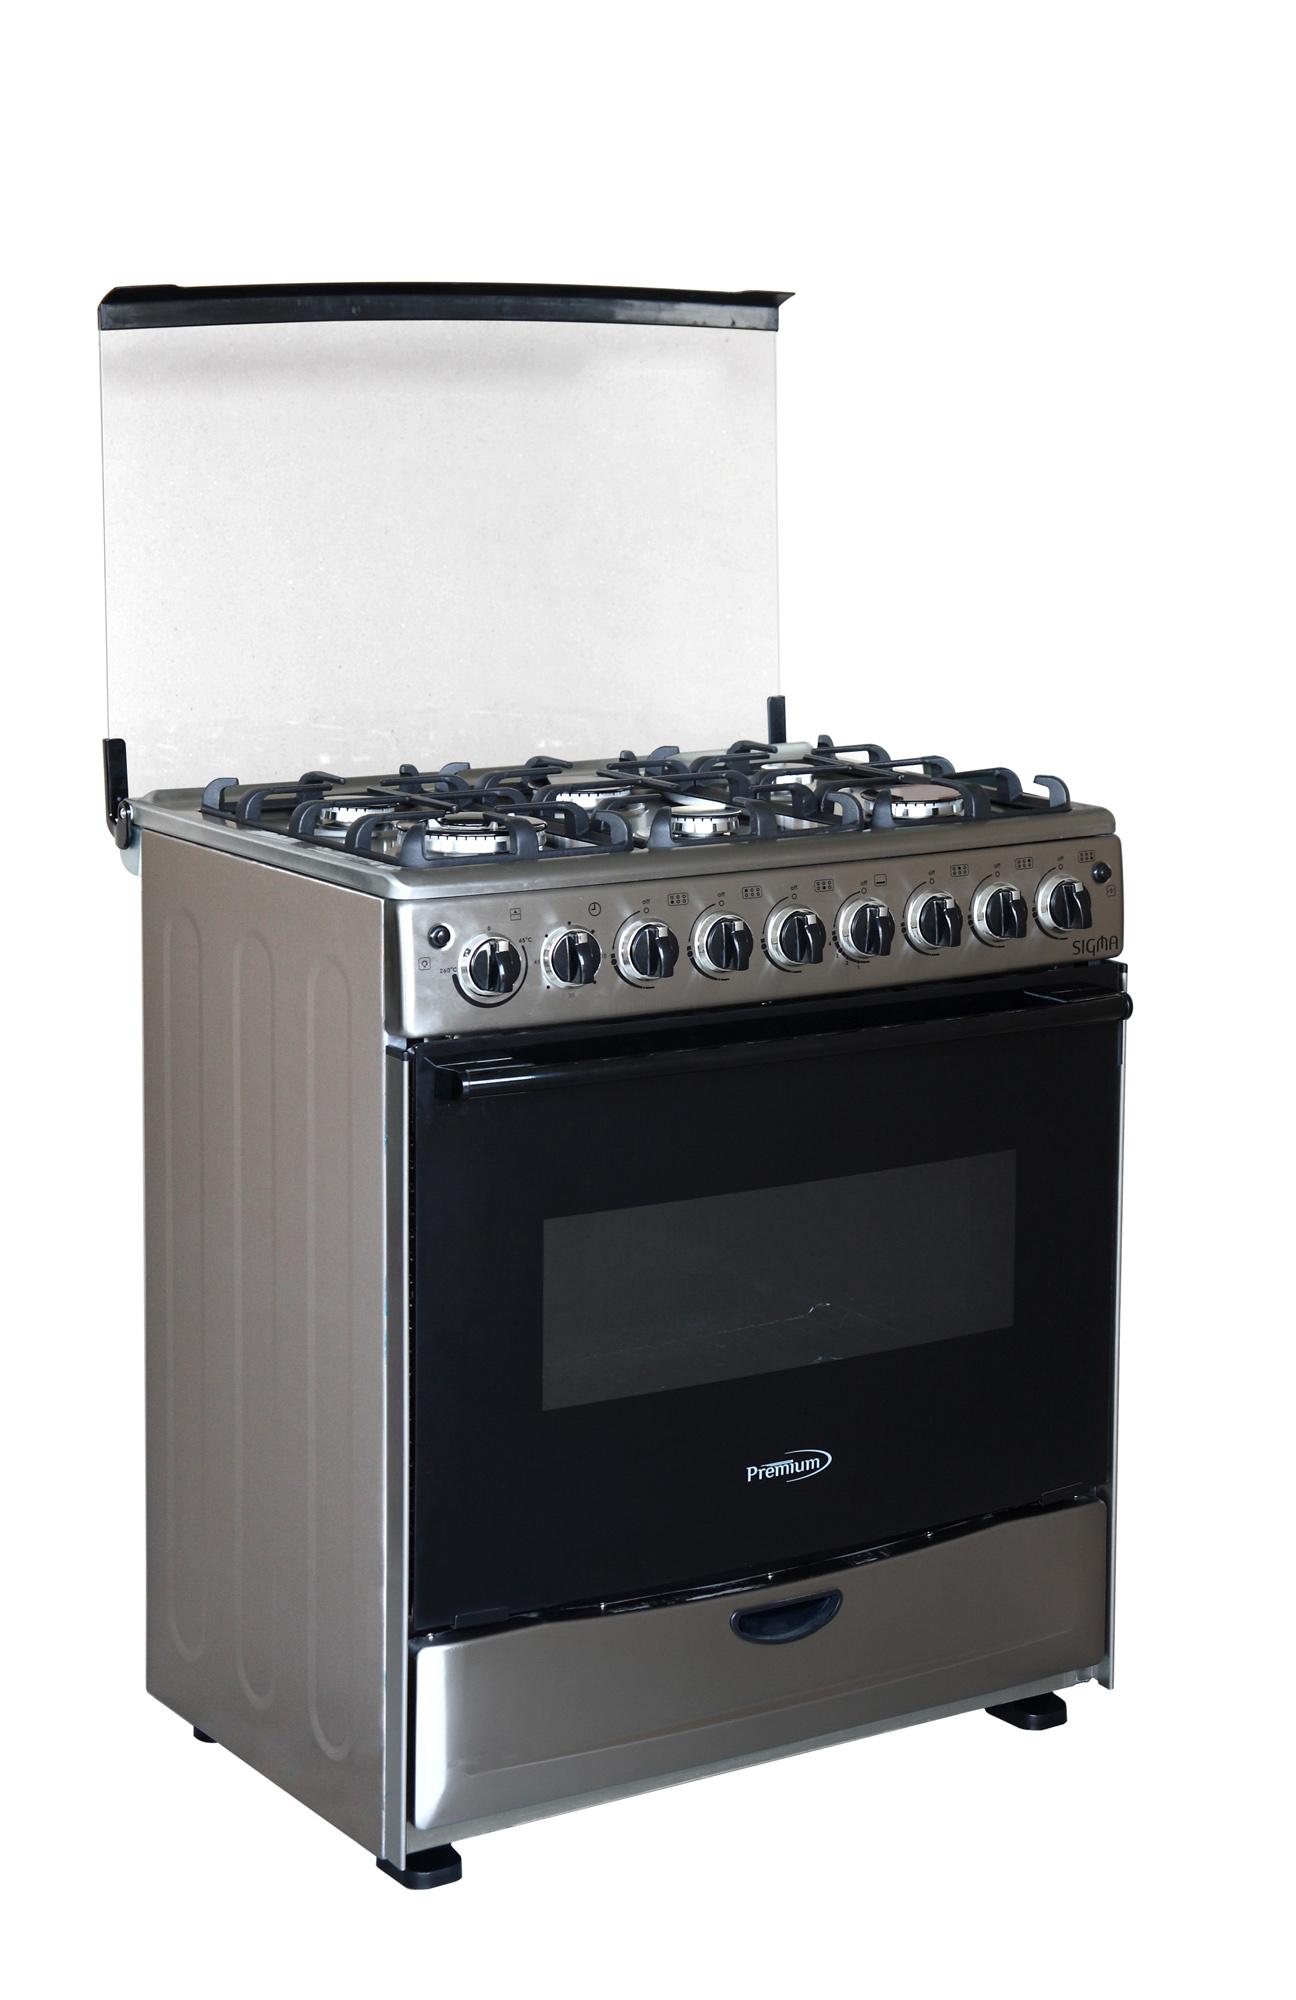 Premium Appliances 6 Burner Gas Stove